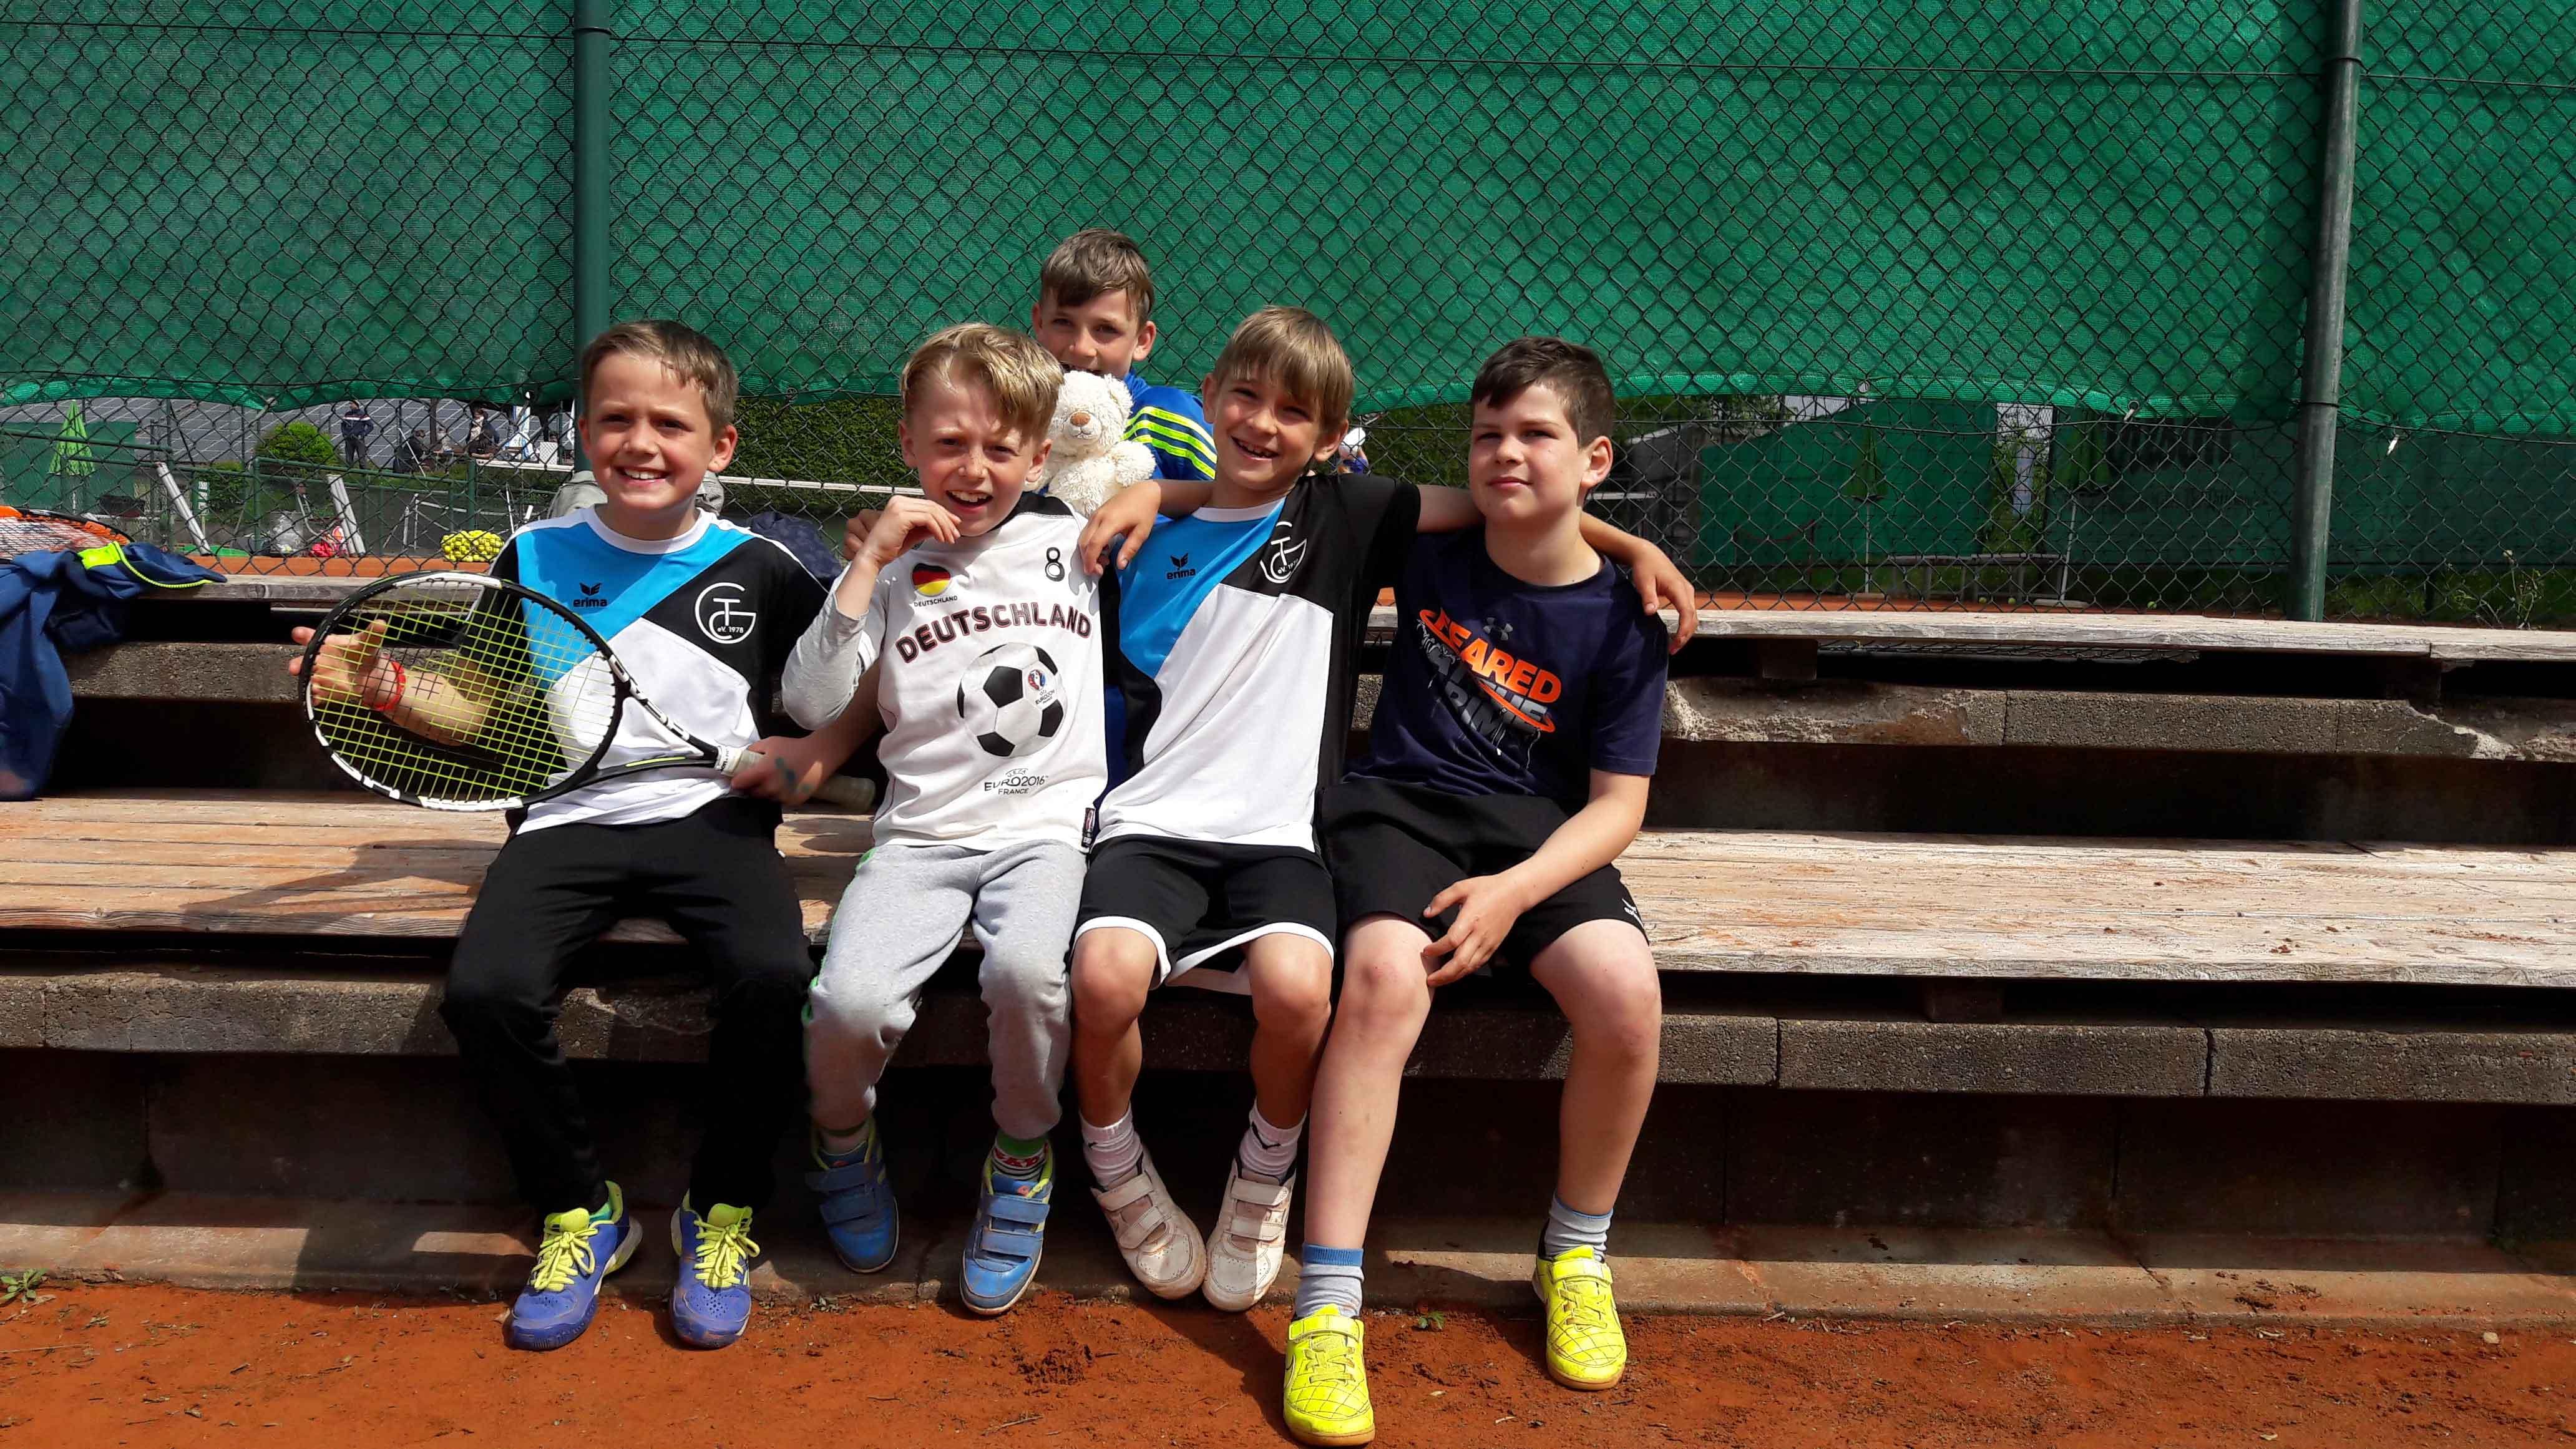 TC-Gernlinden Midcourt Mannschaft